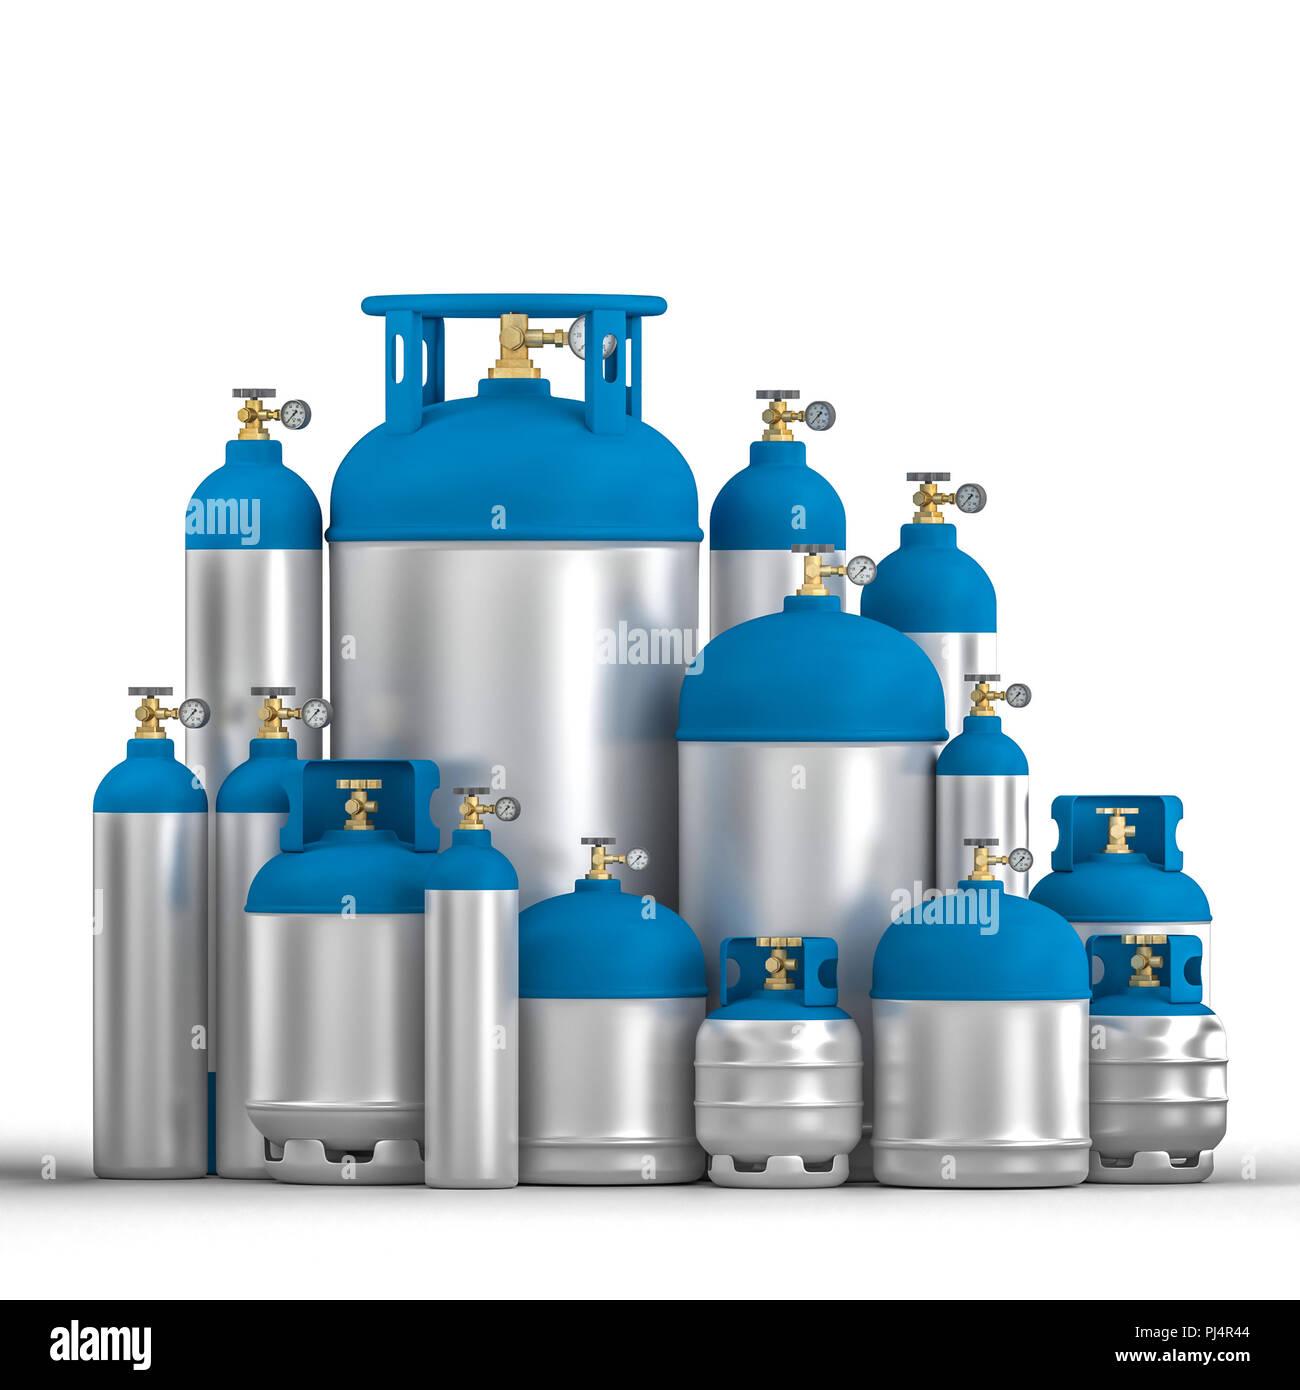 Cylinder Storage Stock Photos & Cylinder Storage Stock Images - Alamy